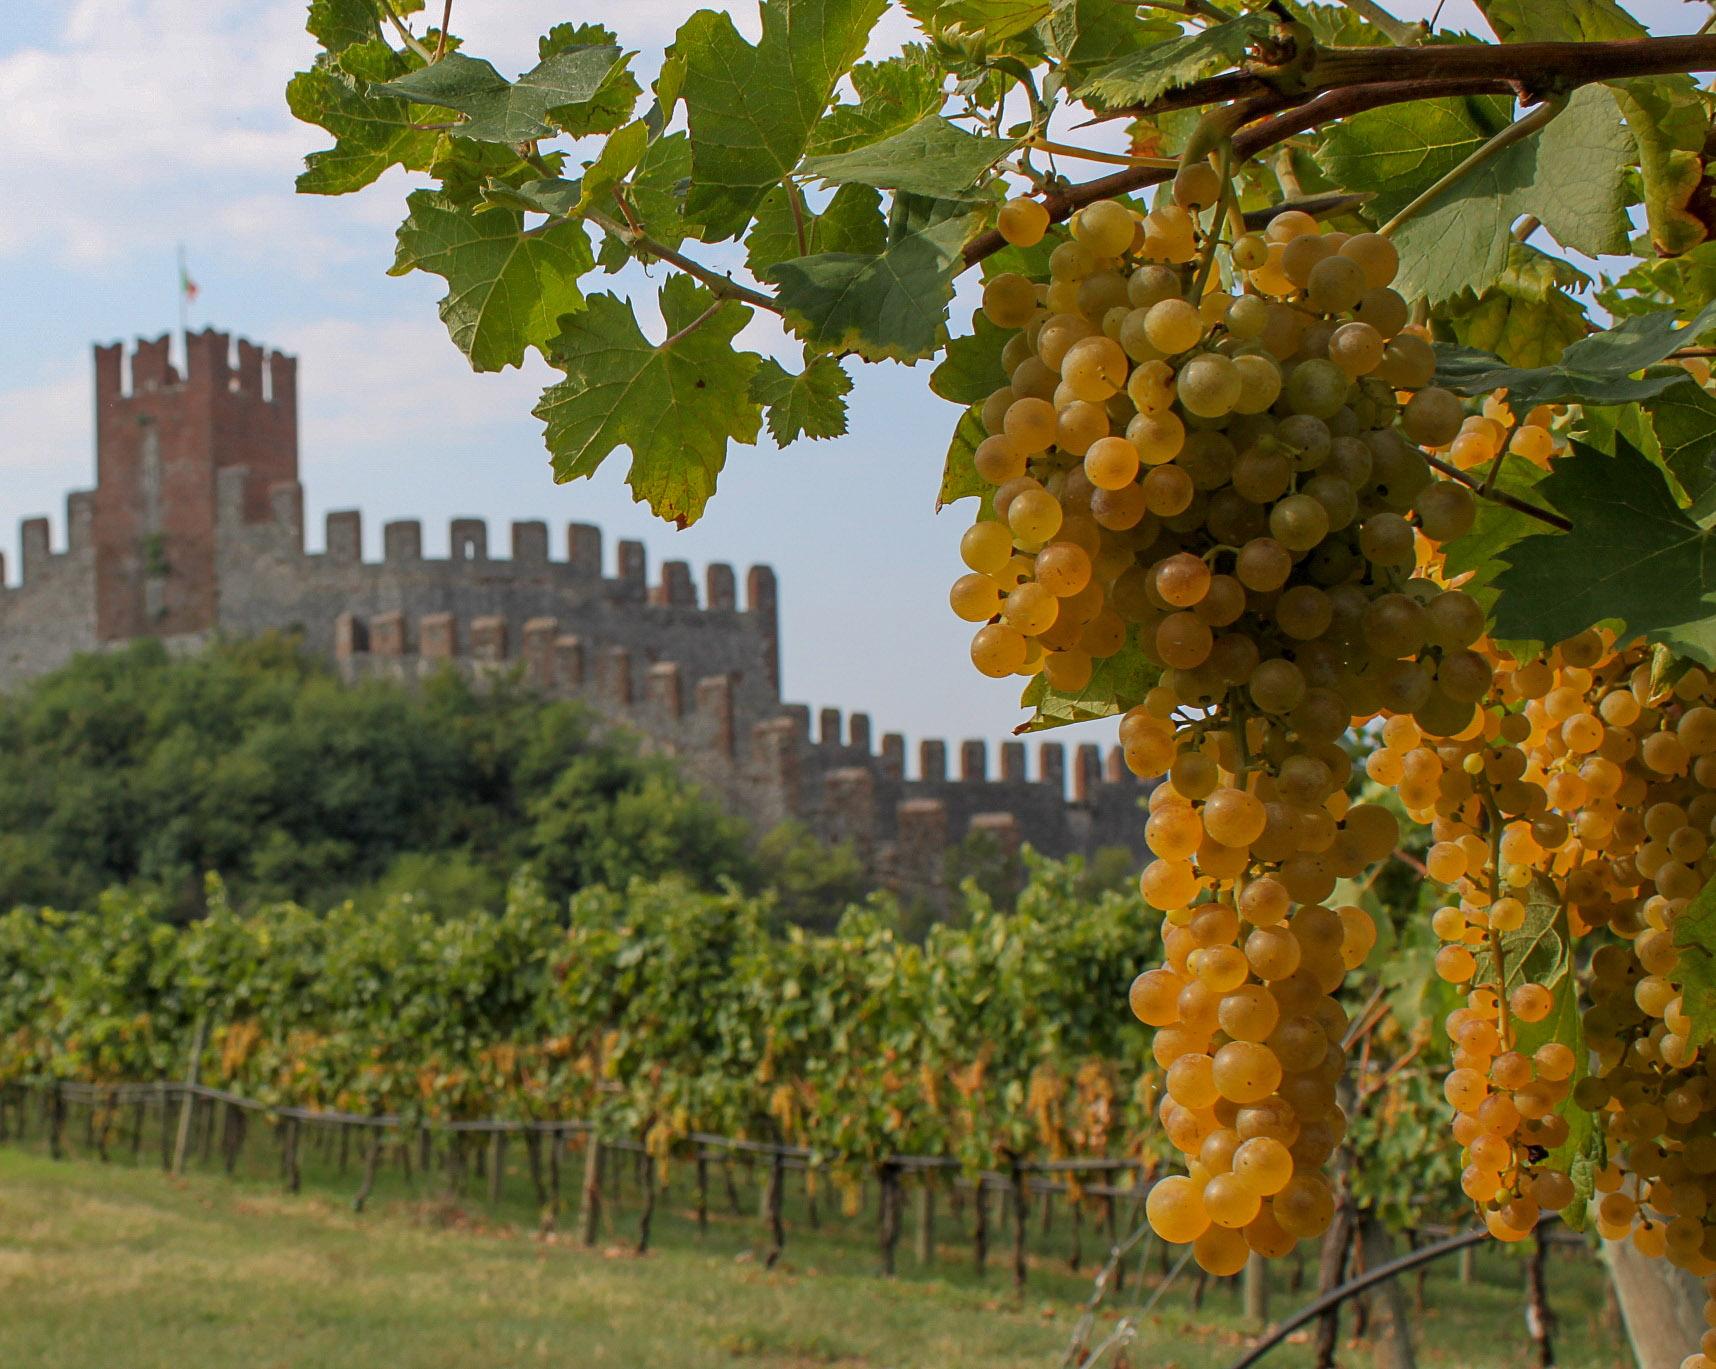 Castello di Soave   ©John Szabo (published by Jacqui Small)